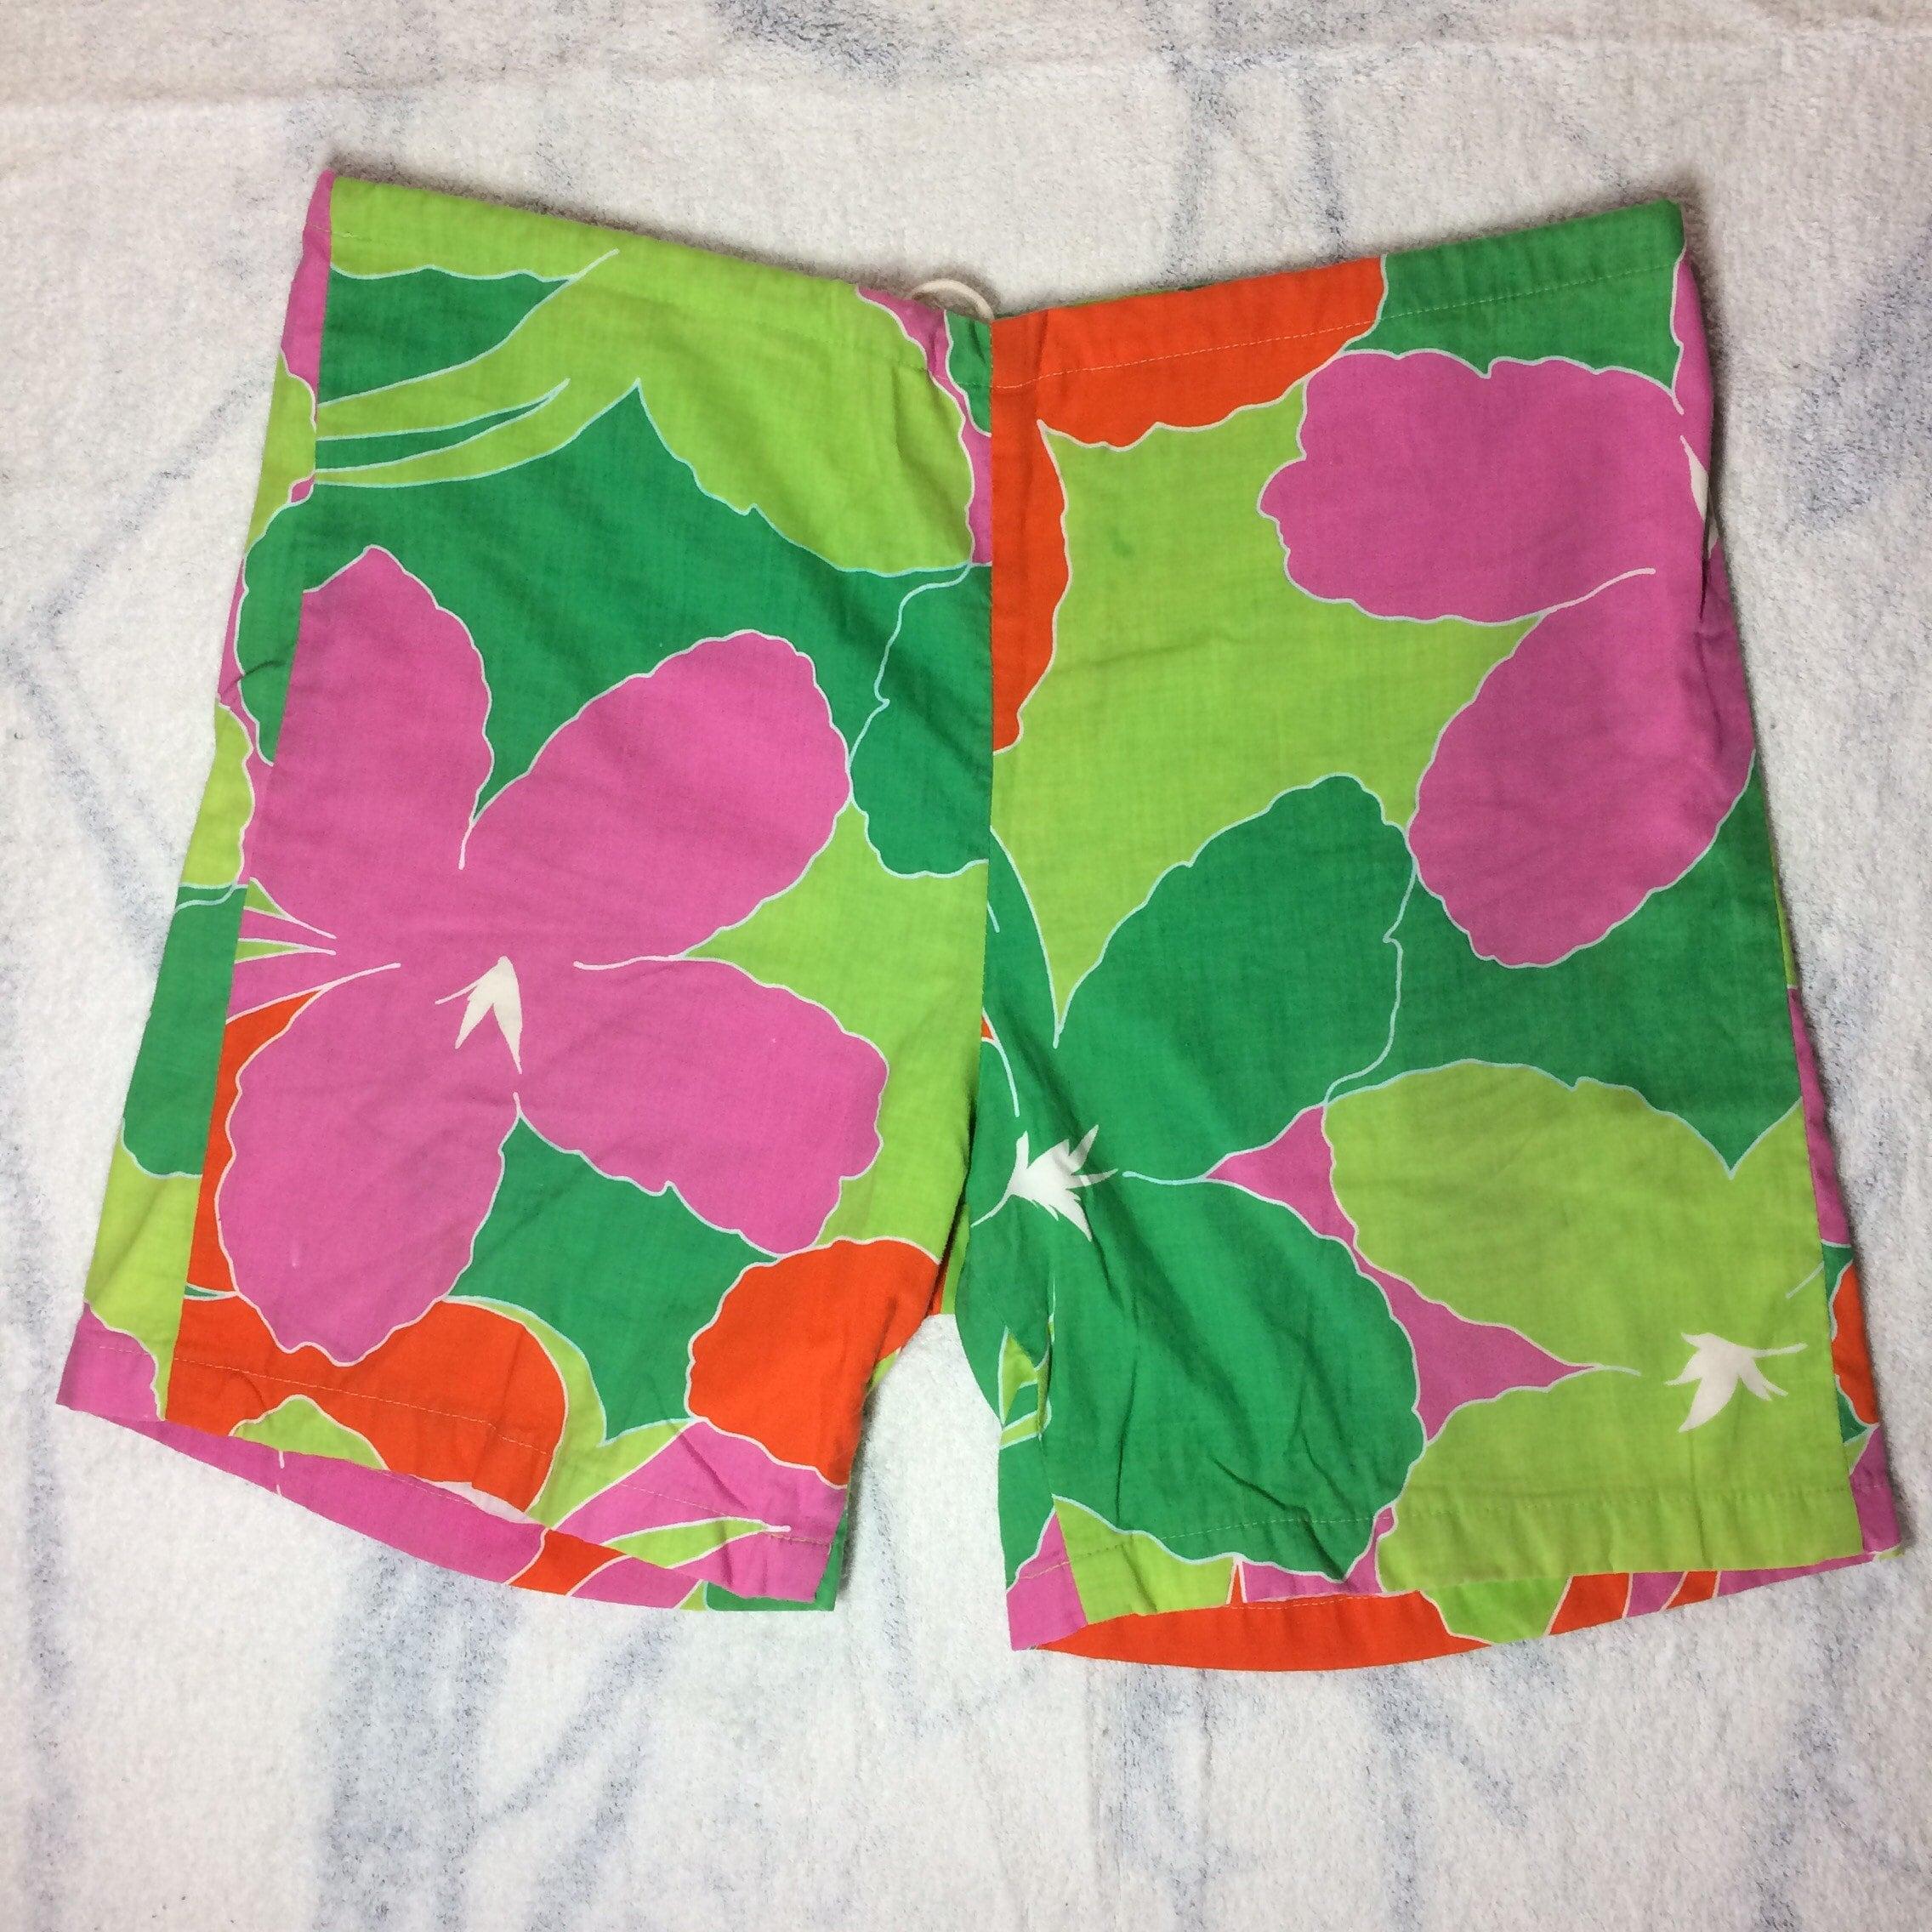 ec1eb7ca71 1980's Board Shorts Original Jams Surf Line Hawaii size medium ...